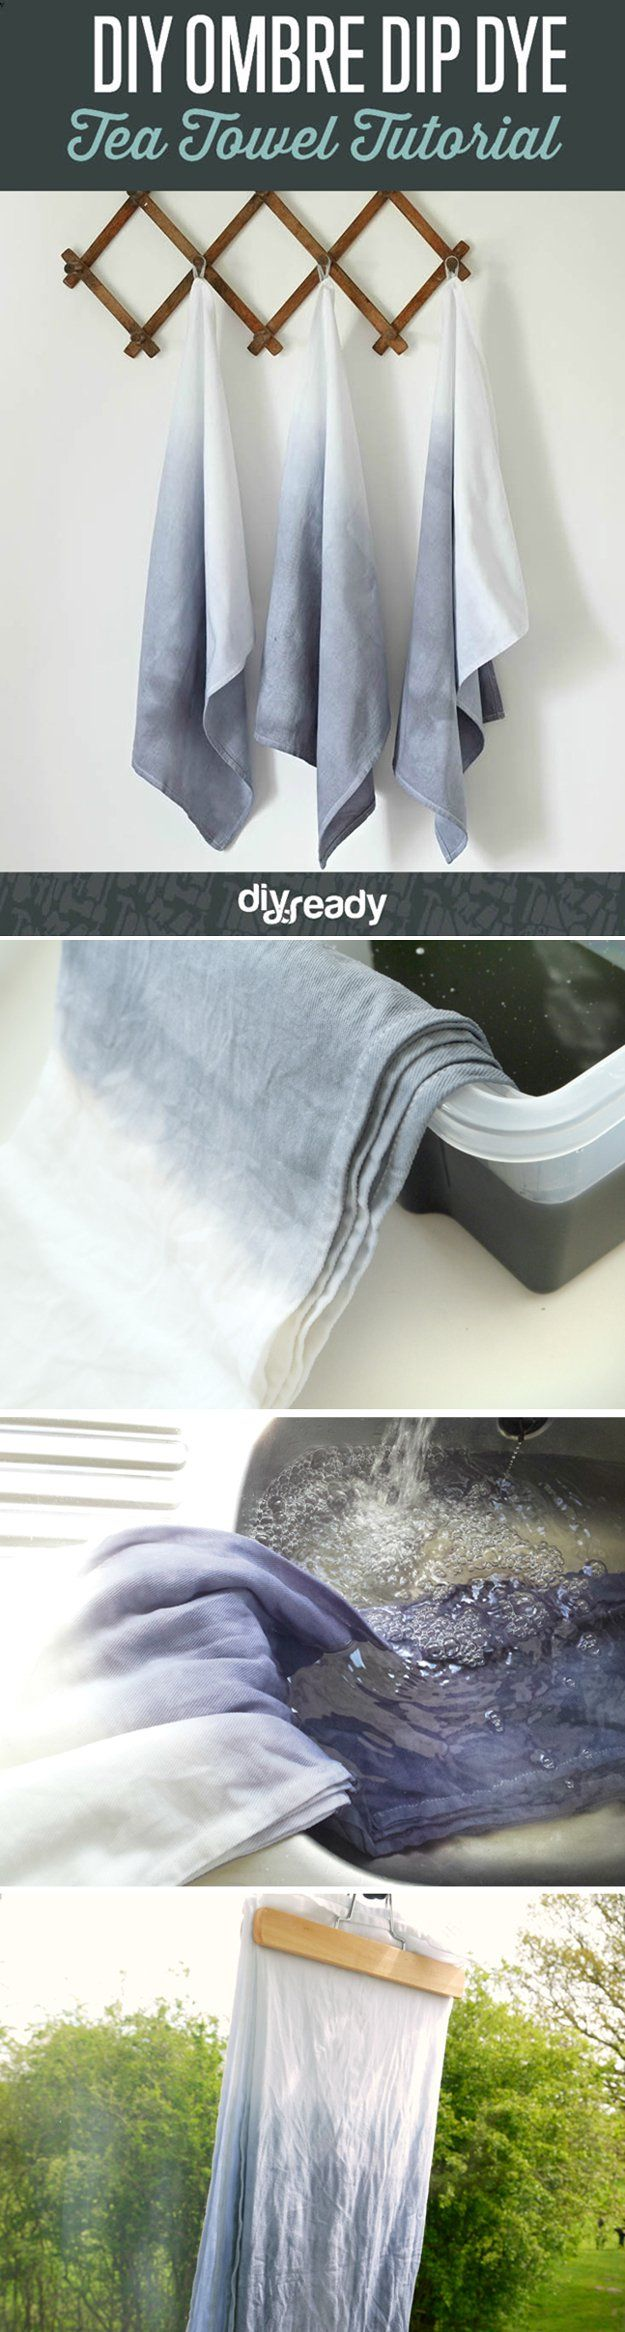 Cheap Baño DIY Decoración en un Ideas Económicos | http://artesaniasdebricolaje.ru/bathroom-decorating-ideas-on-a-budget/